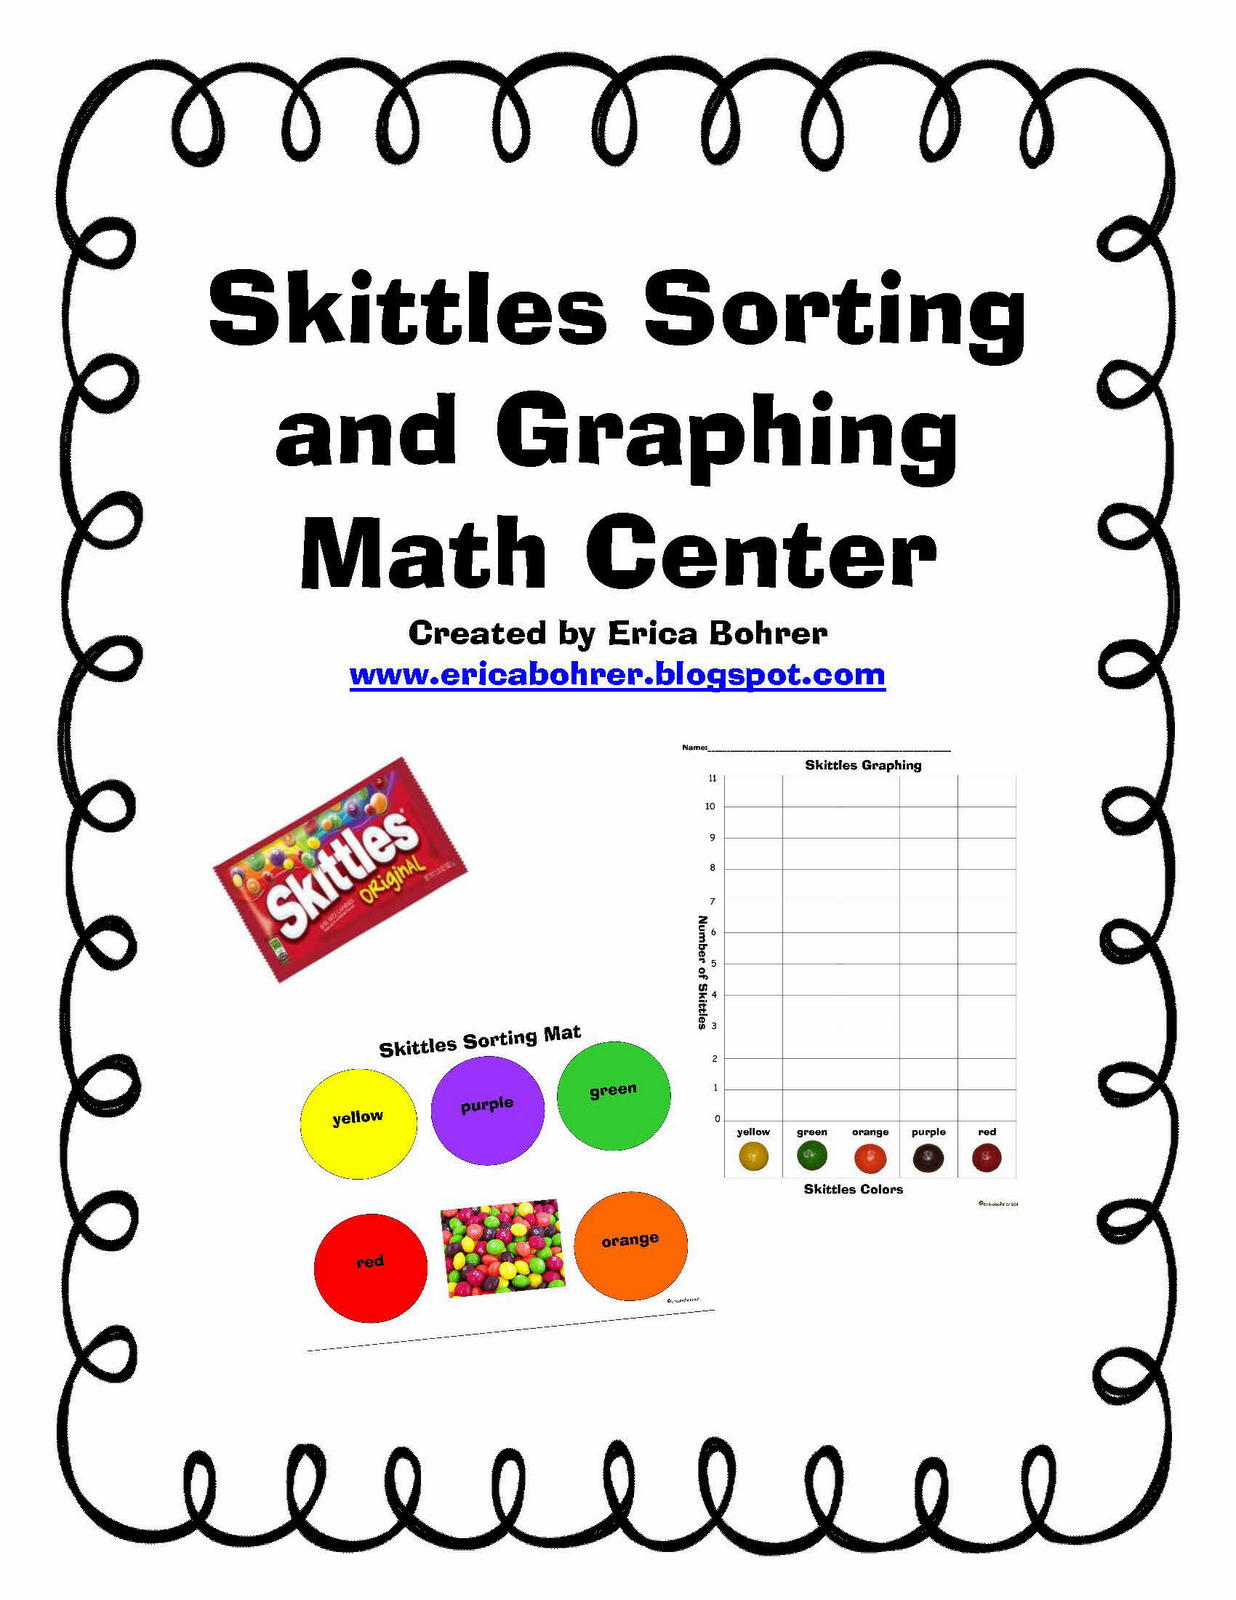 free printable skittles graphing activity worksheet. Black Bedroom Furniture Sets. Home Design Ideas